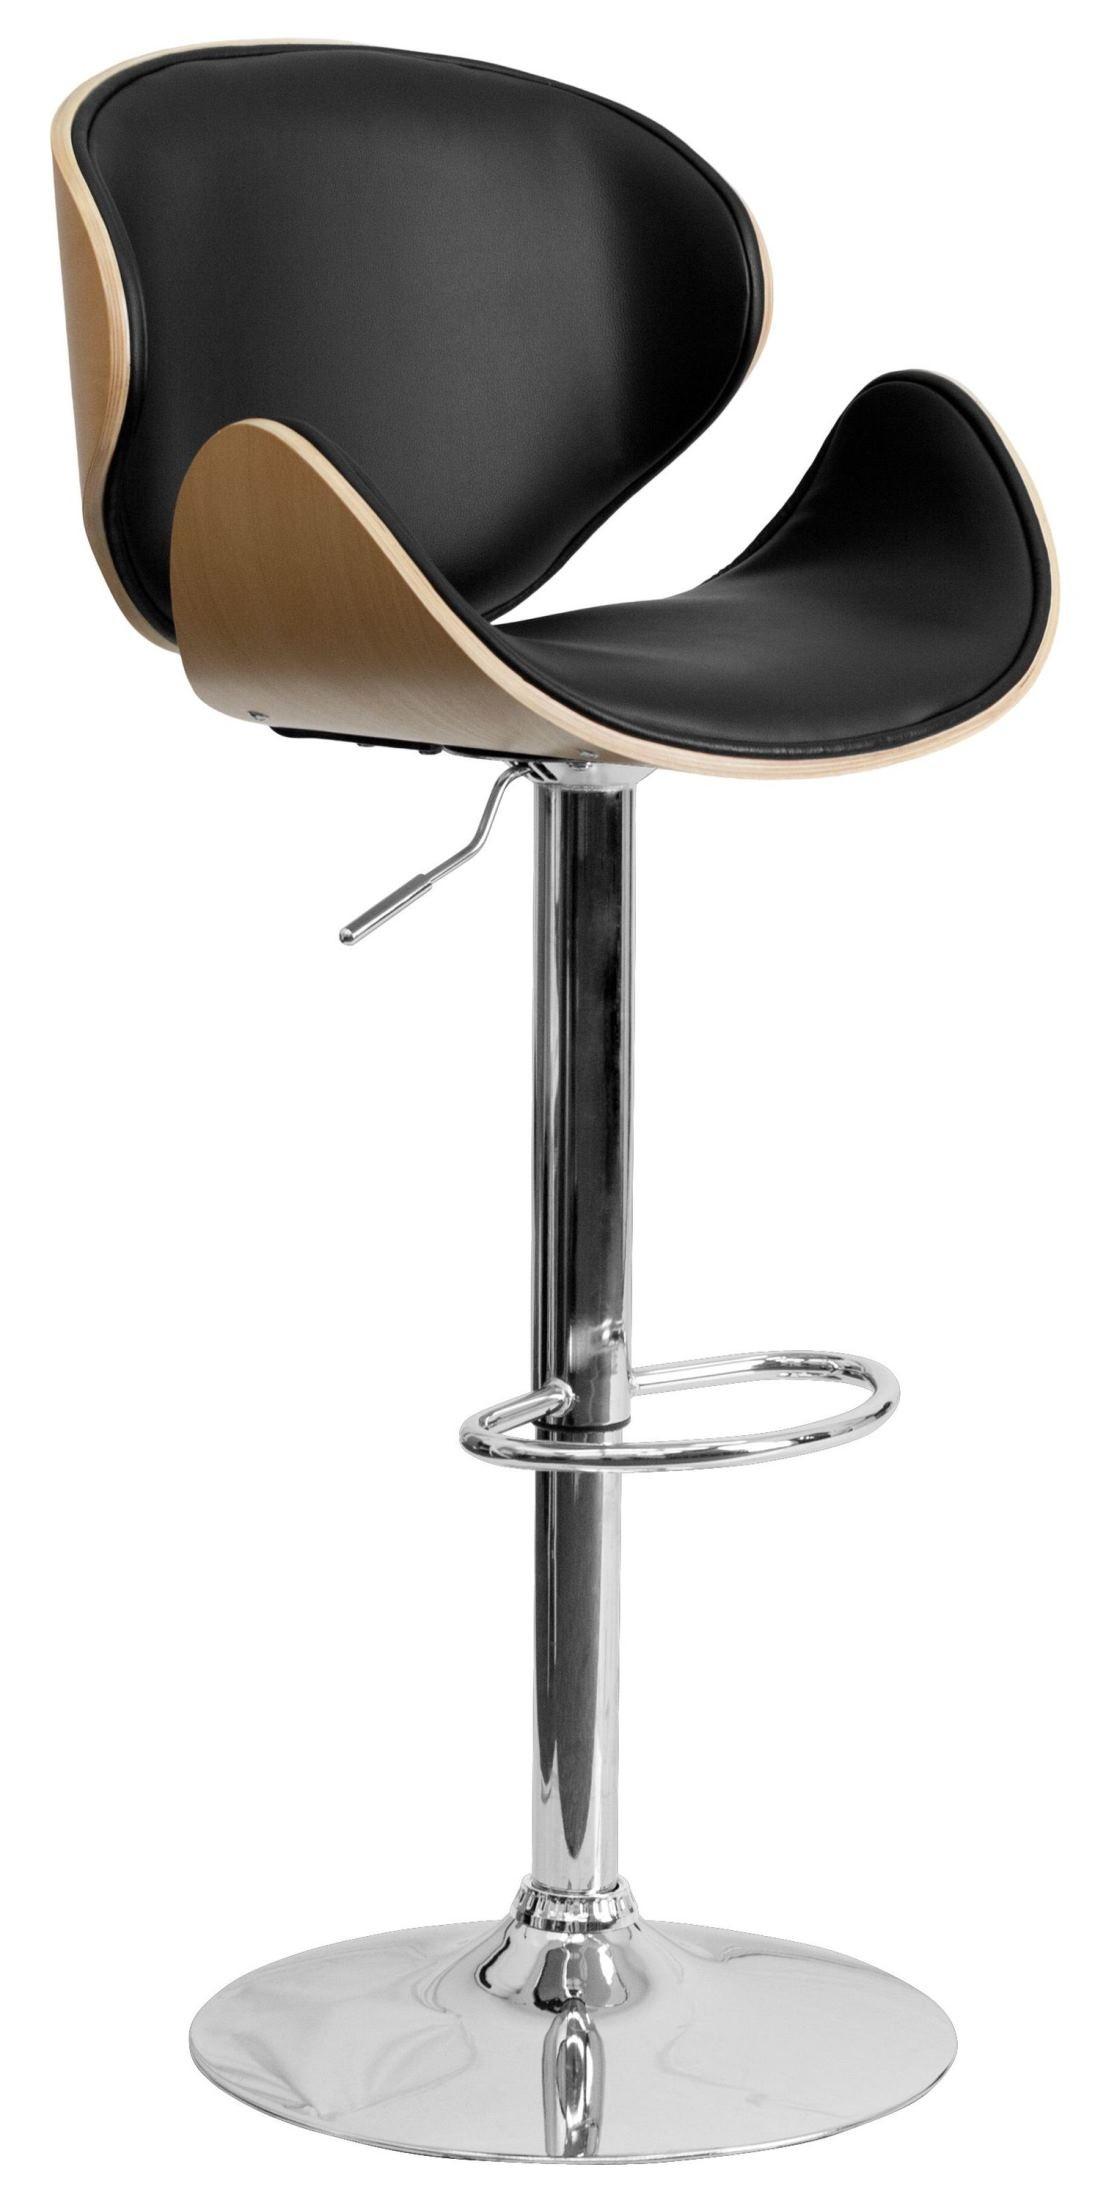 Bentwood Adjustable Height Curved Black Vinyl Bar Stool